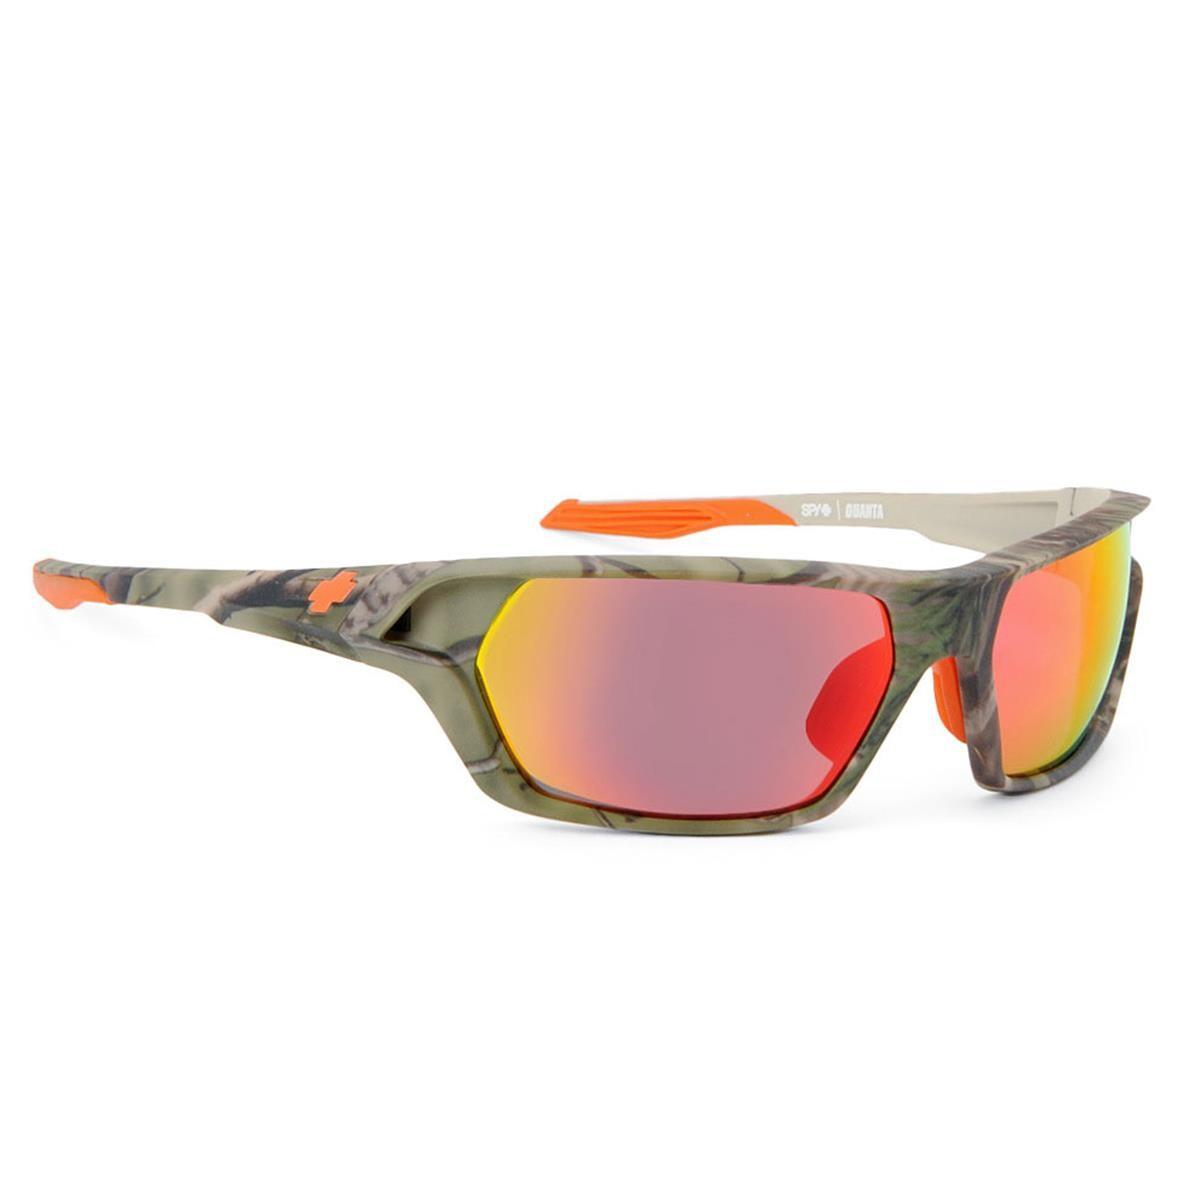 Spy Sonnenbrille Quanta Realtree - Bronze/Orange Spectra | Maciag ...